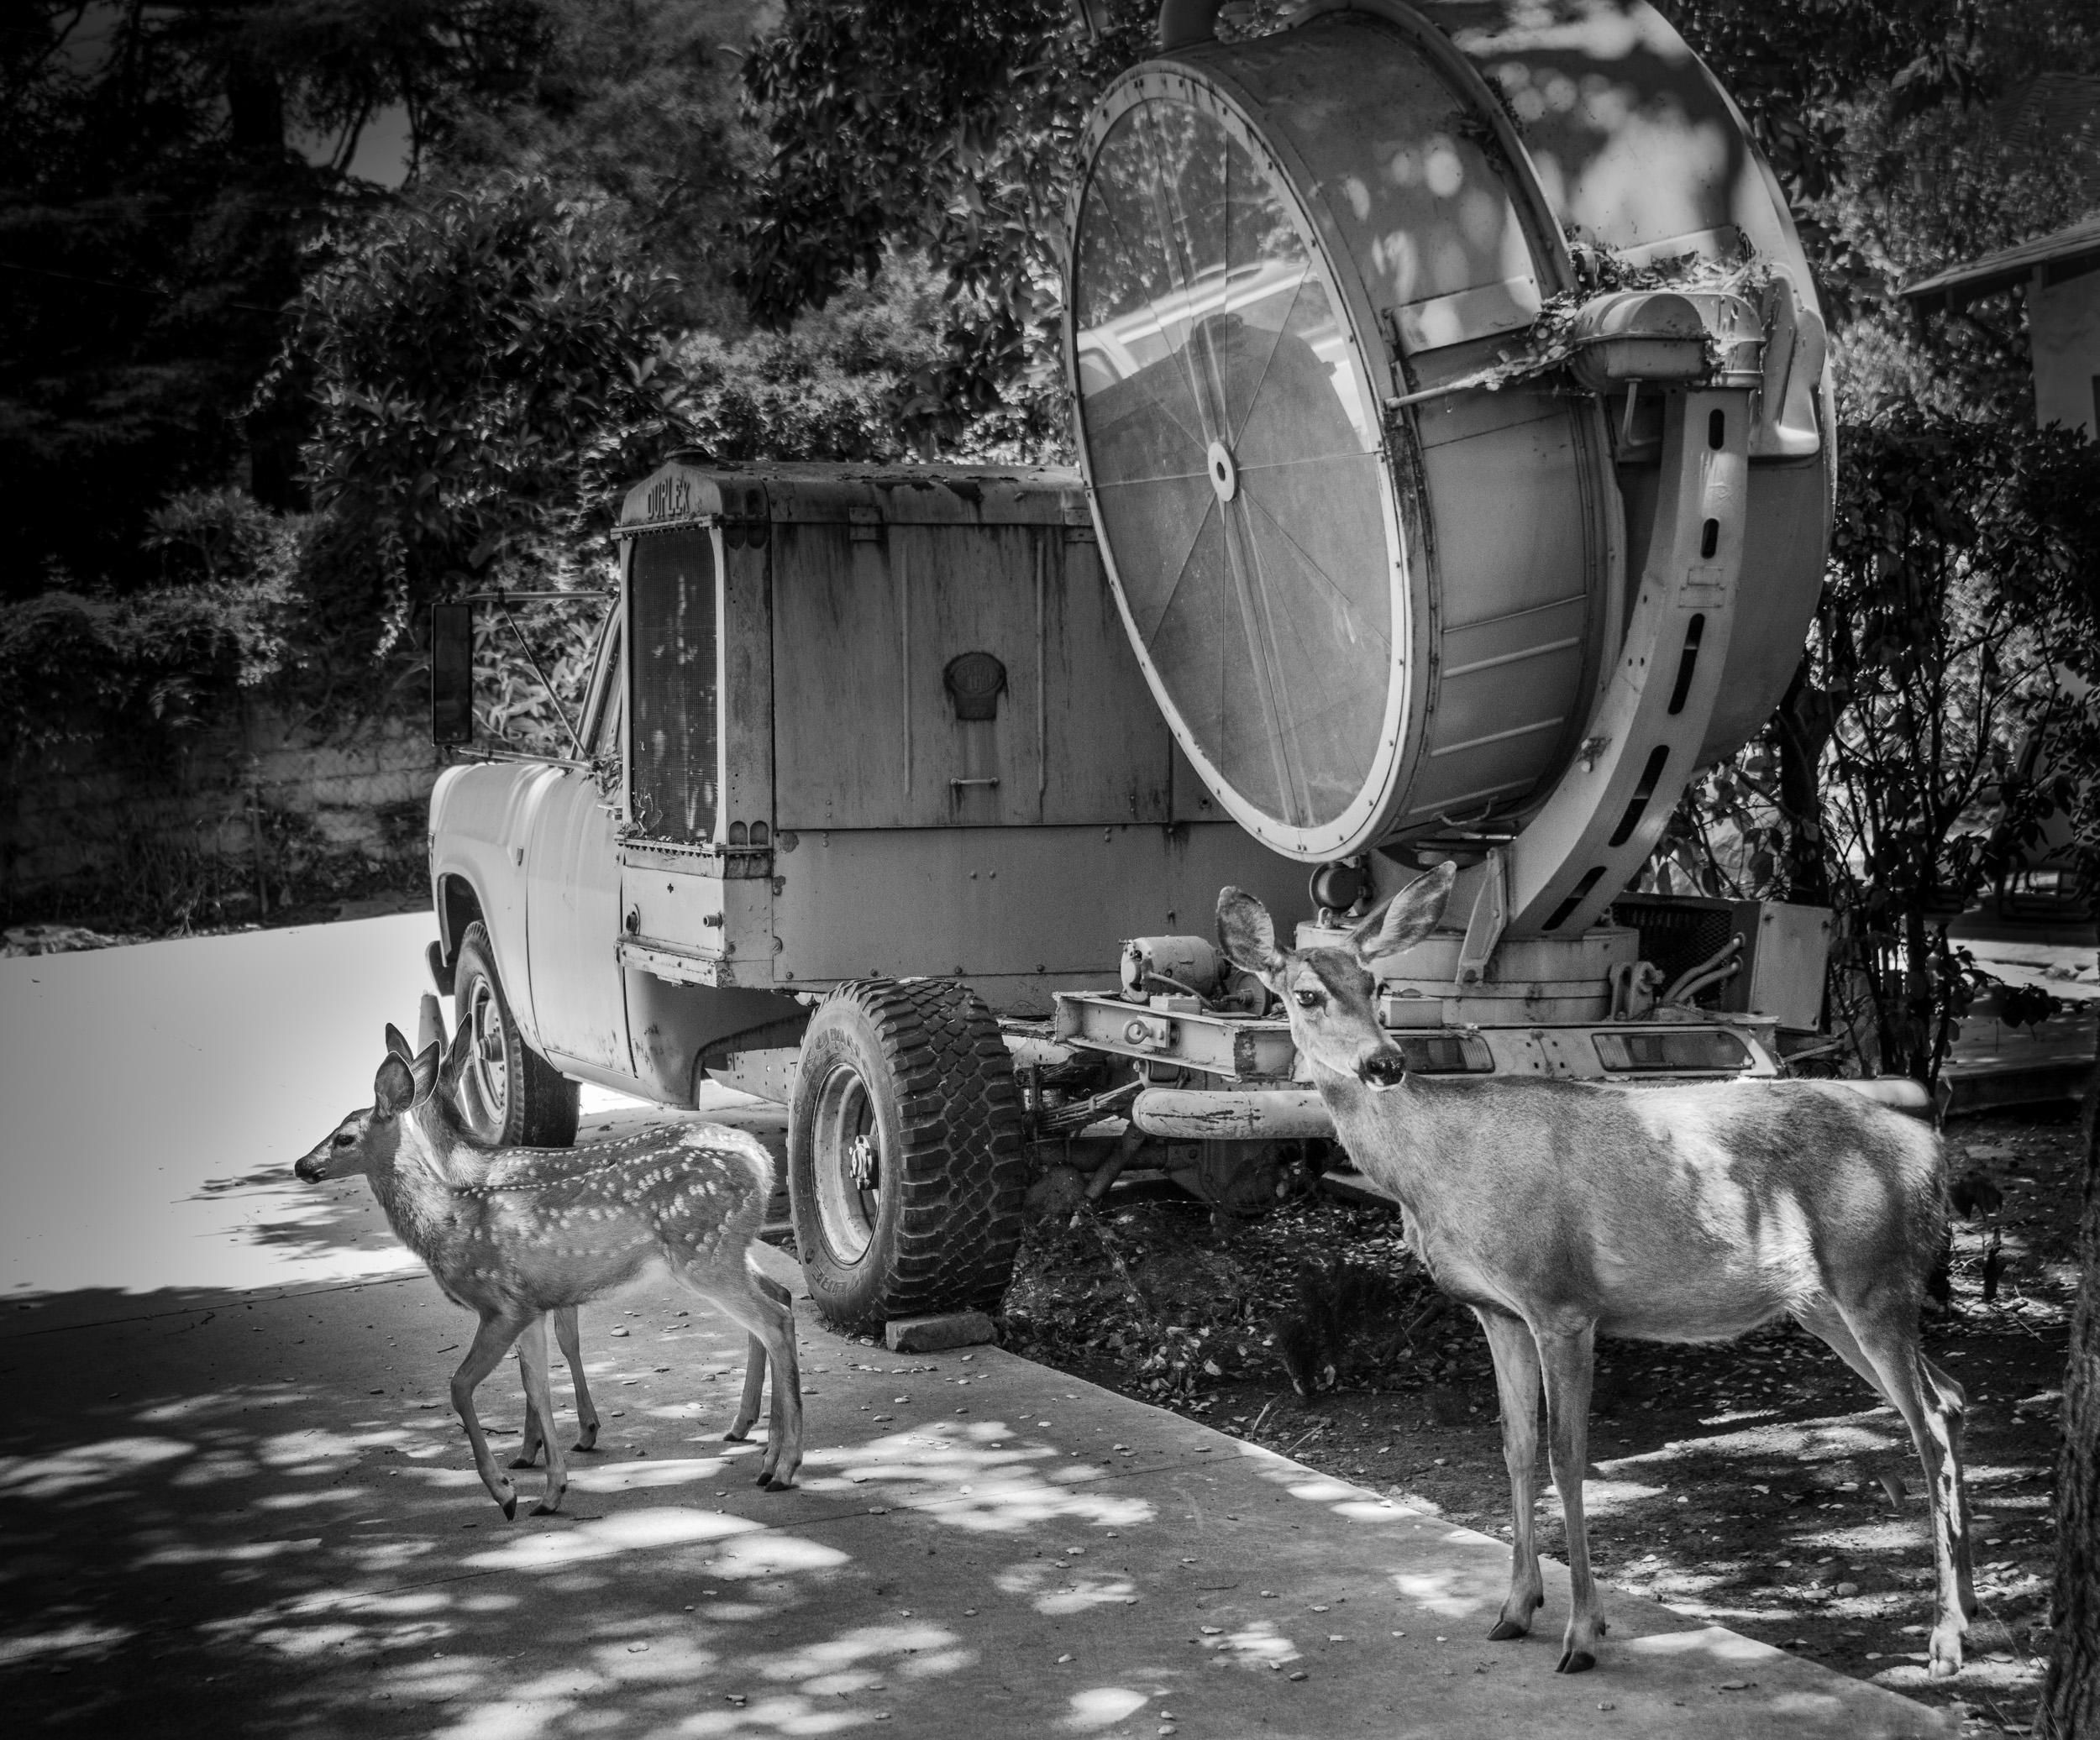 Deer and Spotlight, Monrovia, California © Robert Welkie 2018